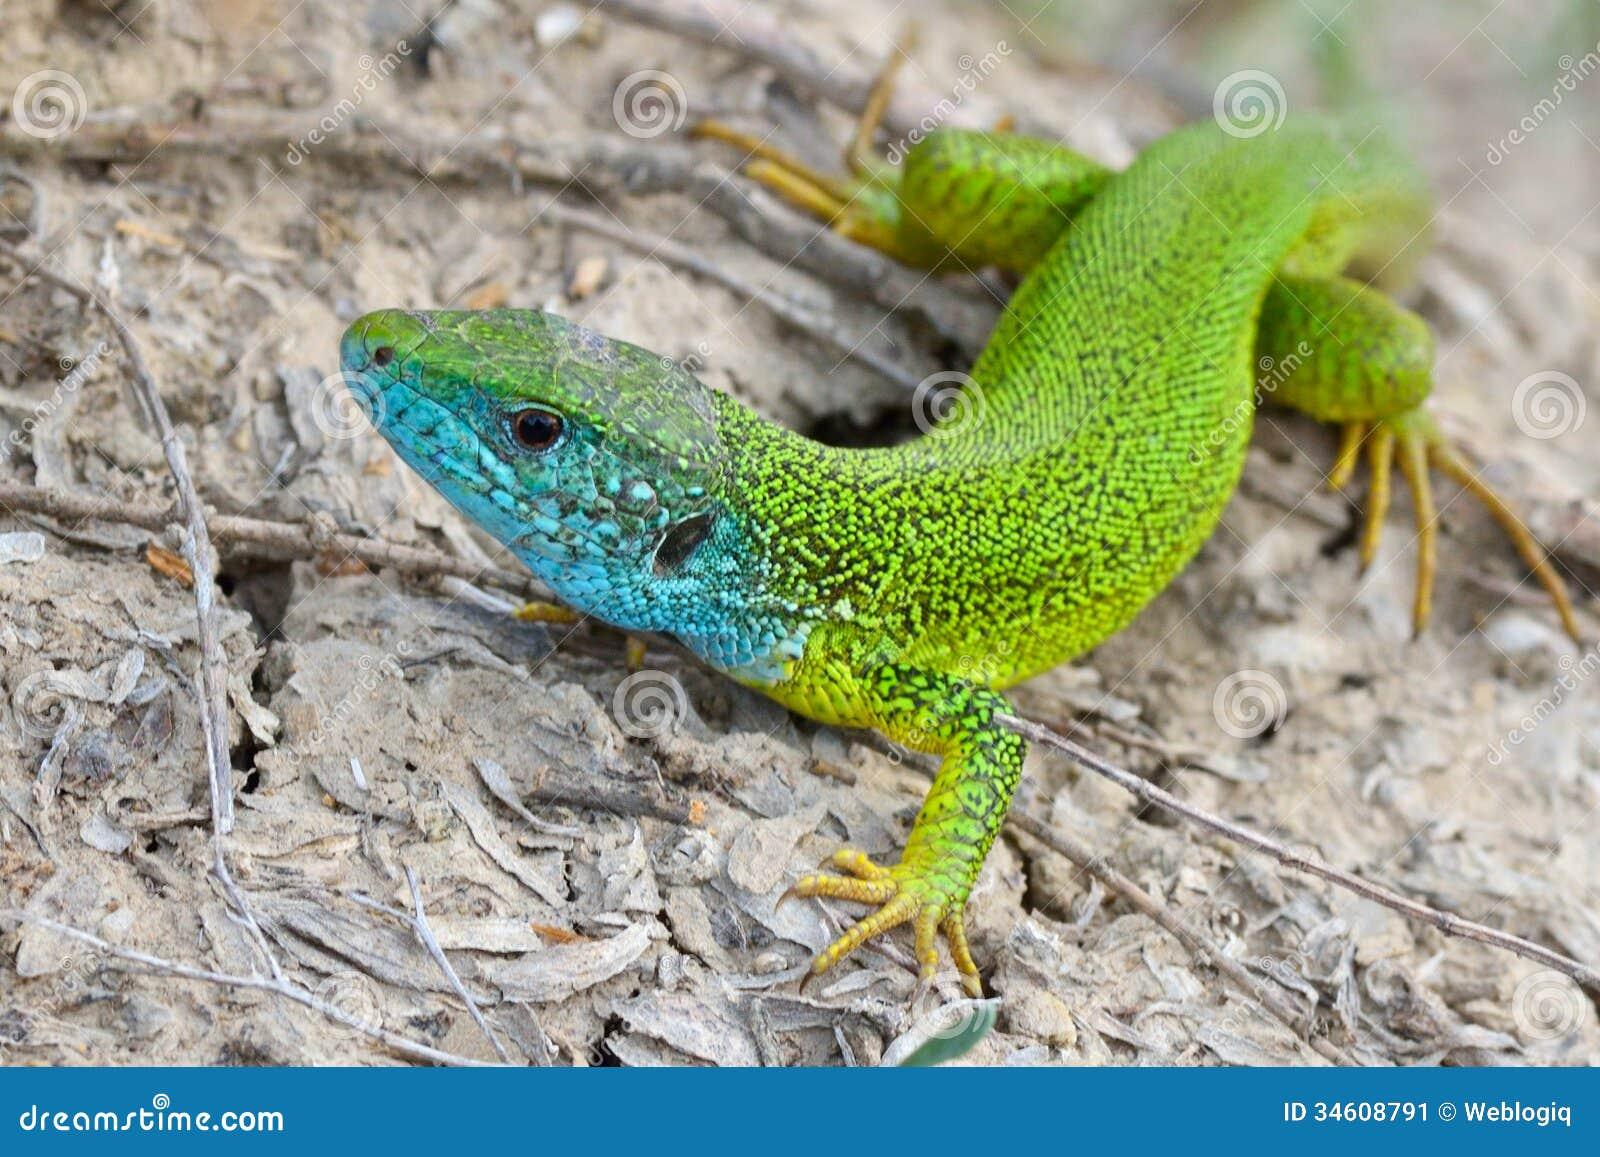 Mâle de lézard vert - viridis de Lacerta